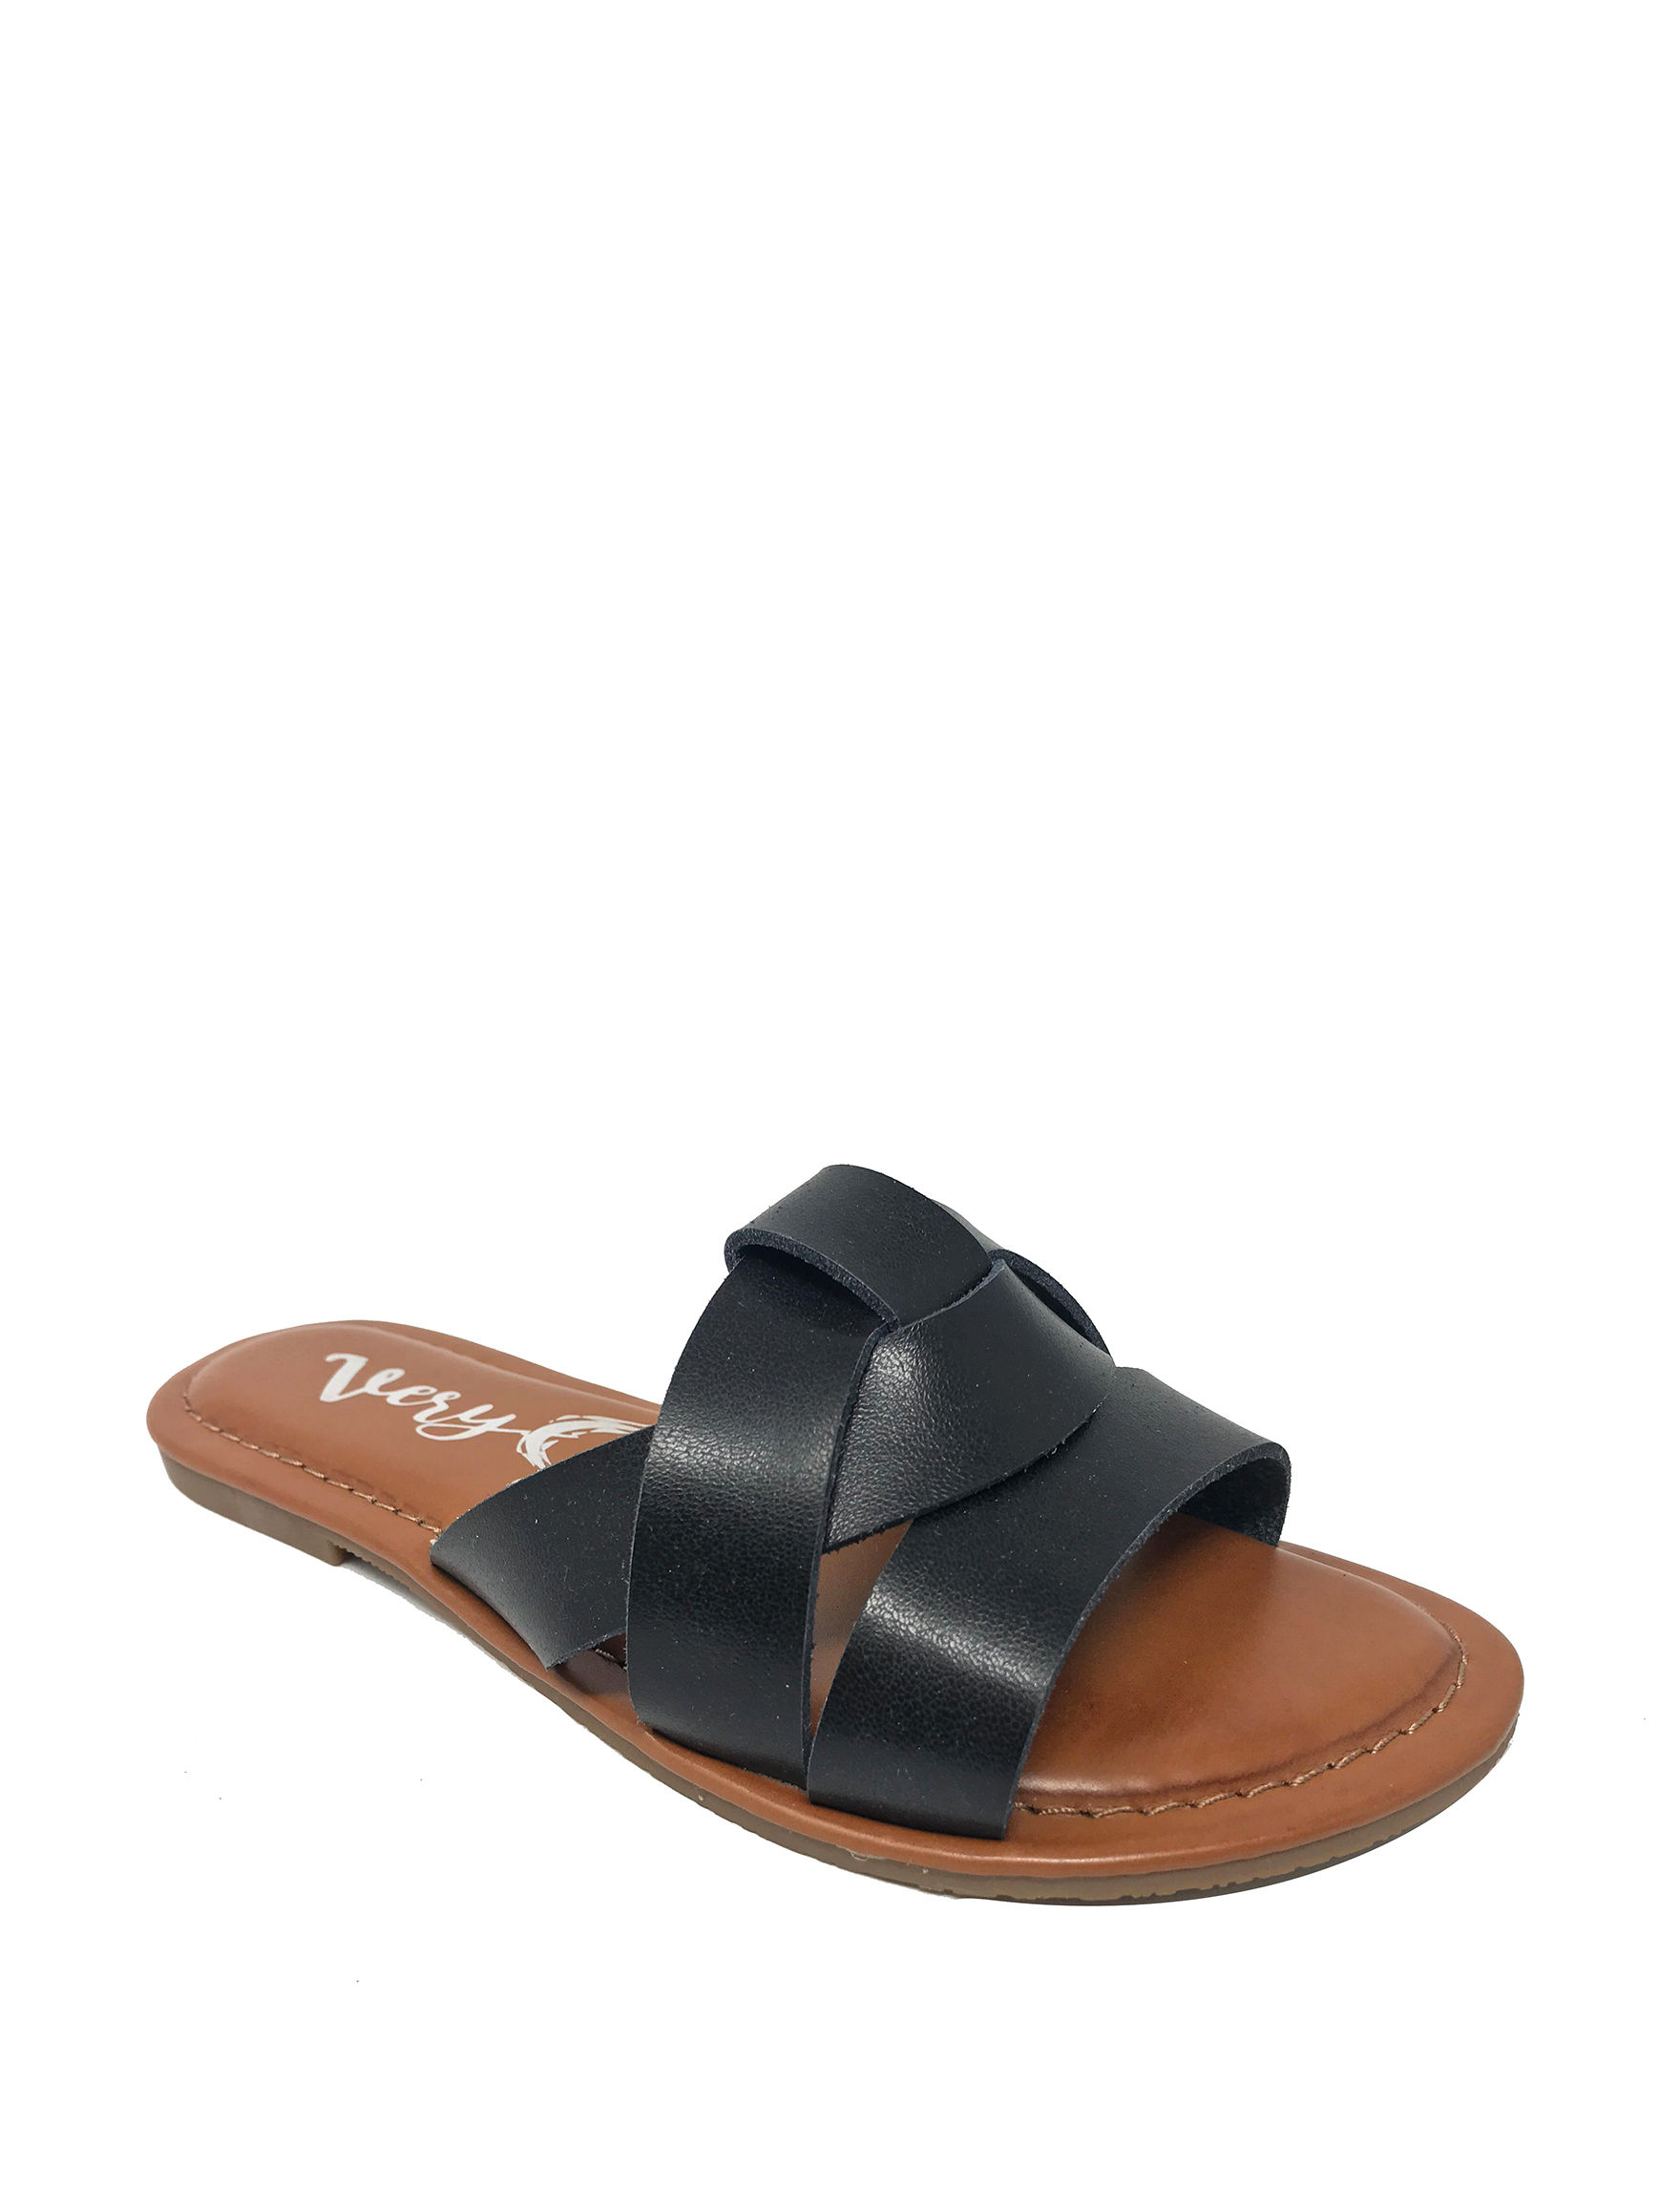 Very G Black Flat Sandals